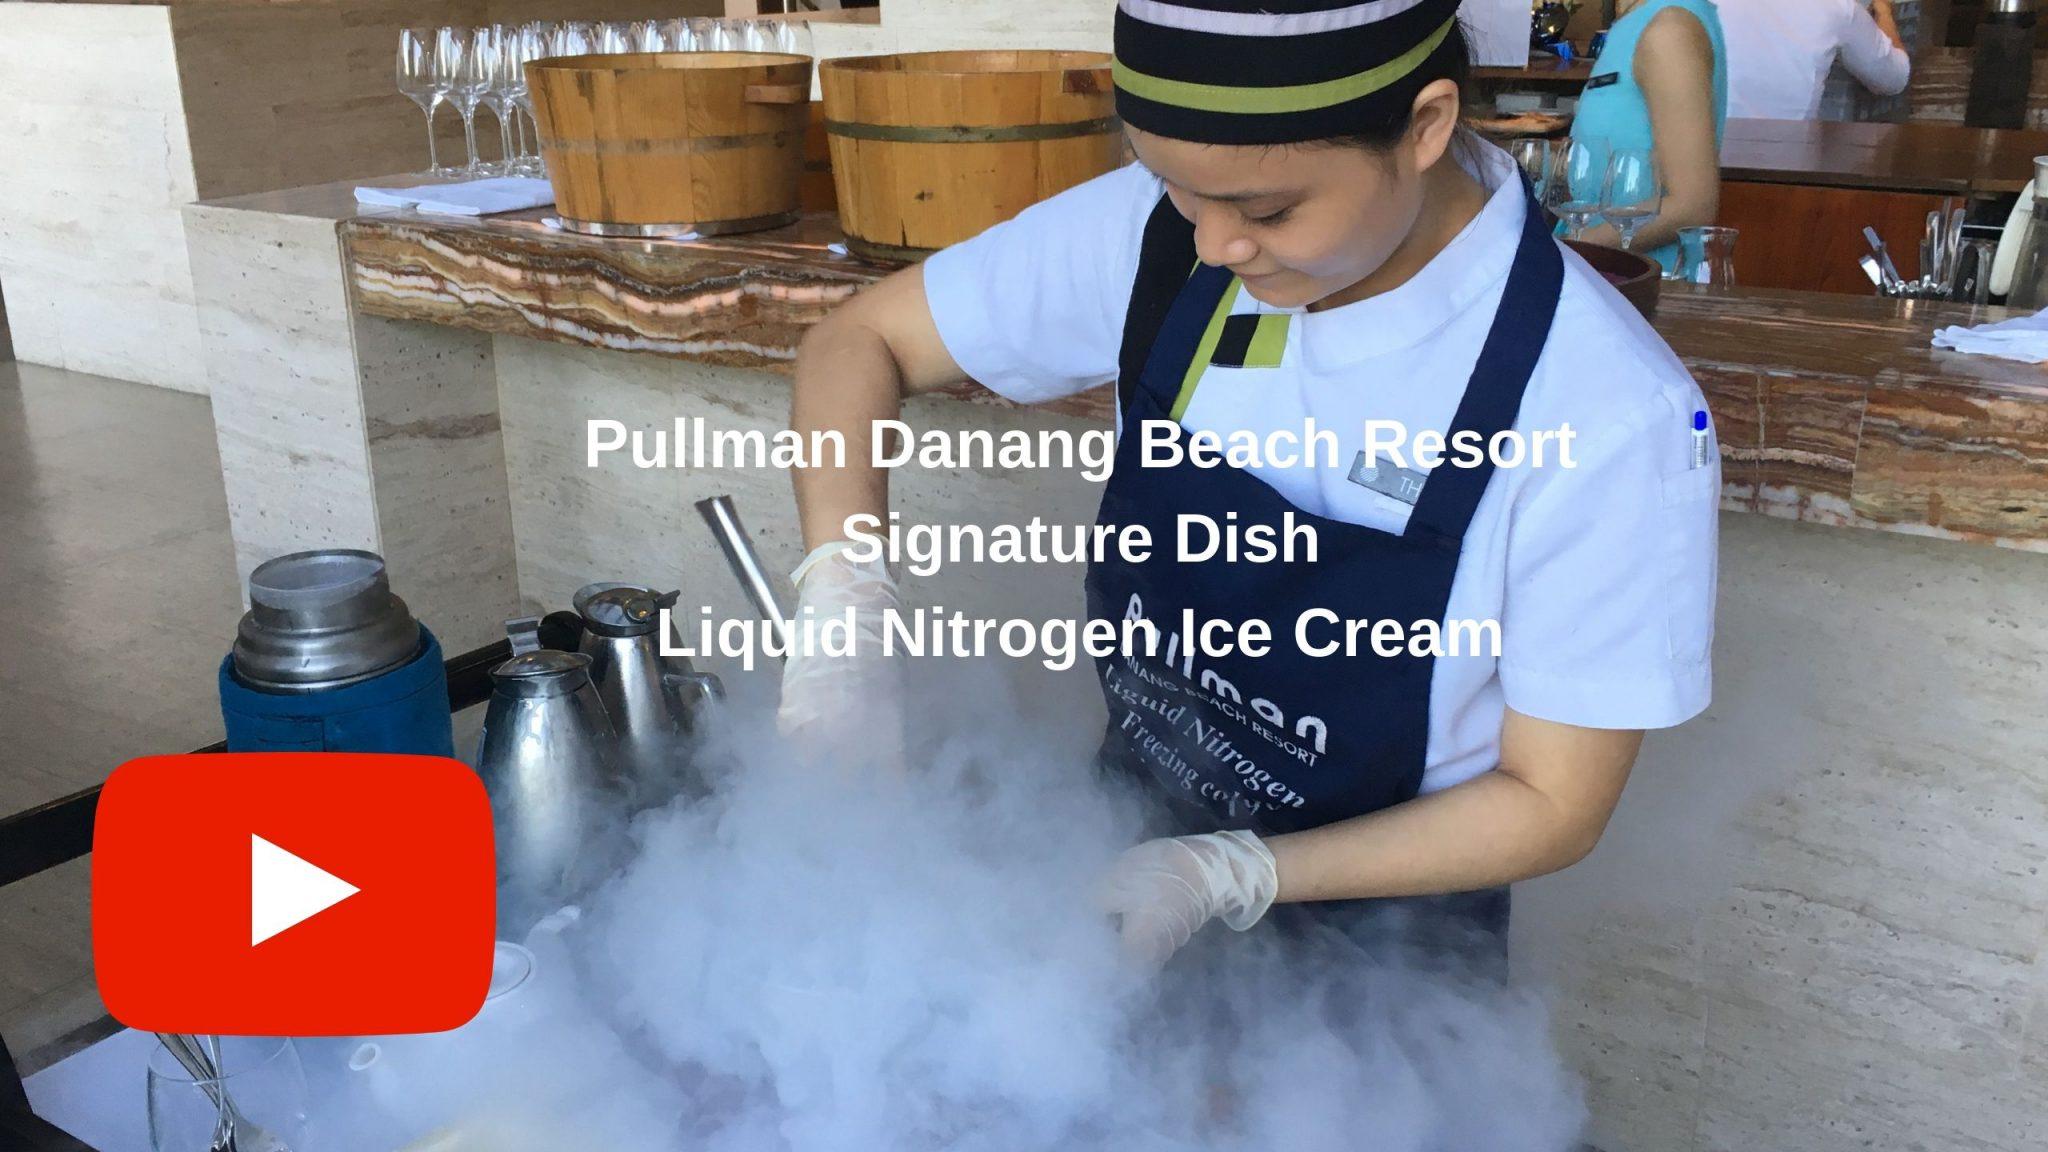 Making Liquid Nitrogen Ice Cream at Pullman Danang Beach Resort